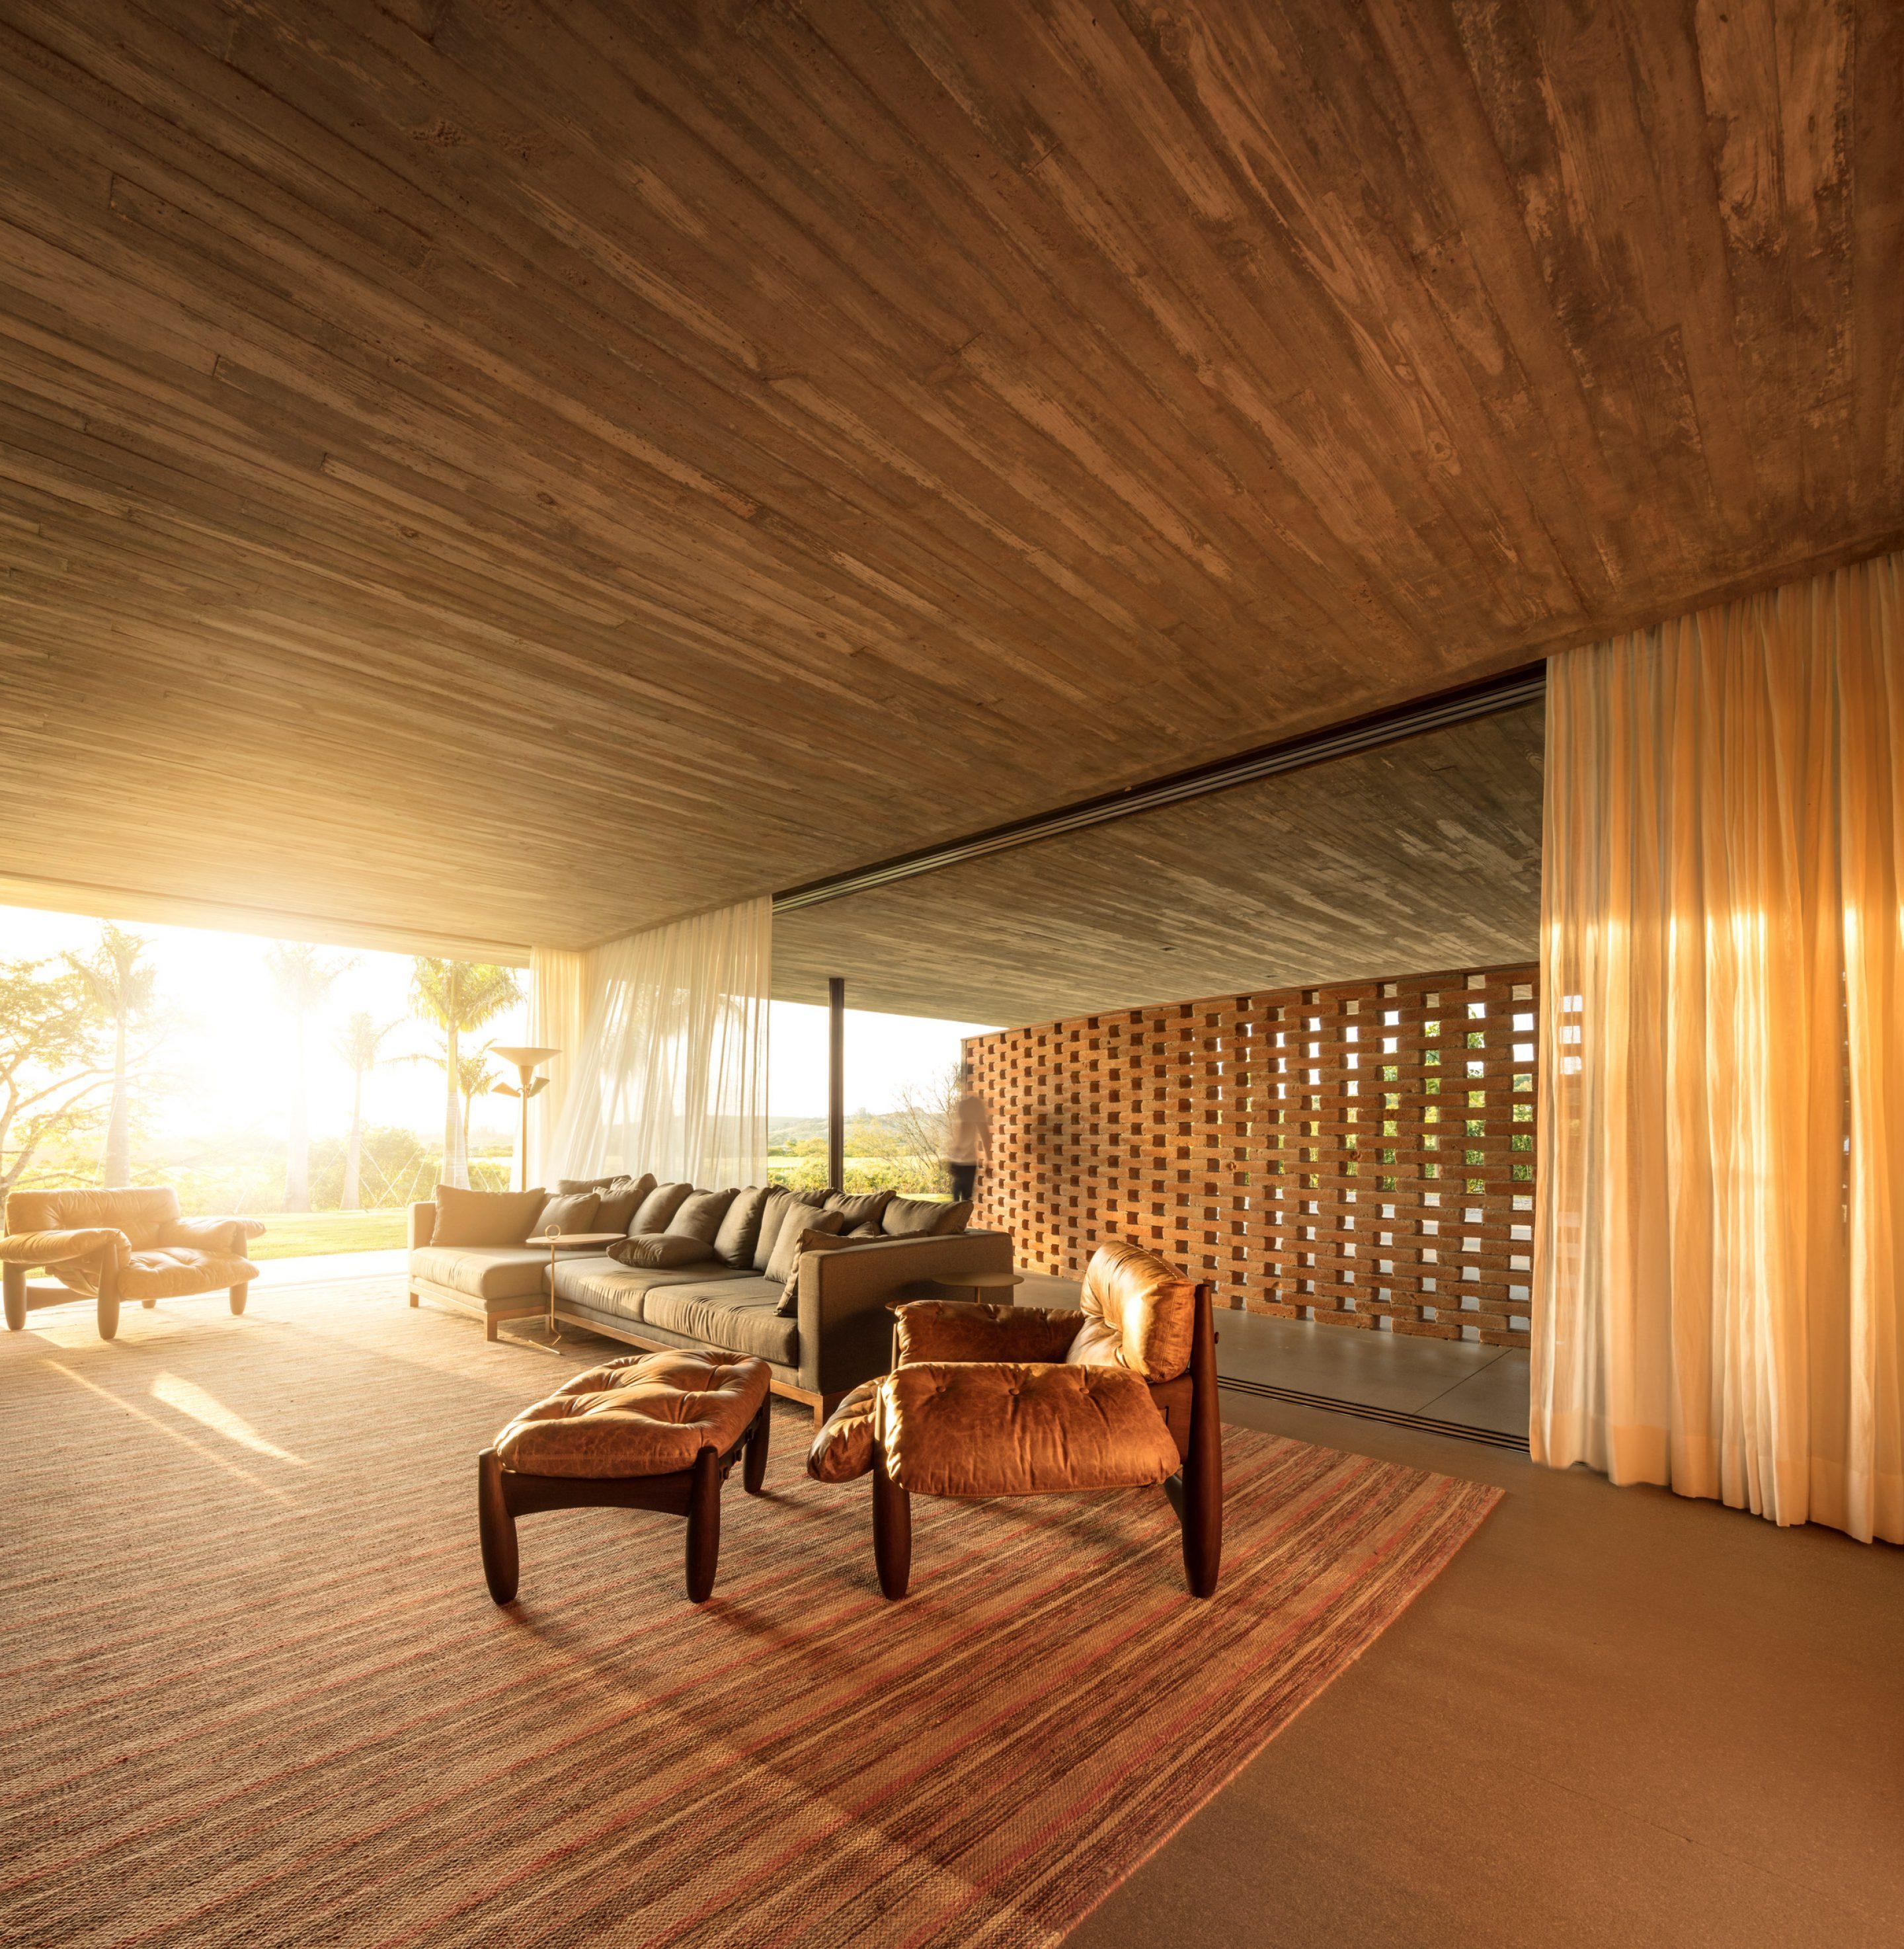 iGNANT-Architecture-Studio-MK27-Planar-House-028